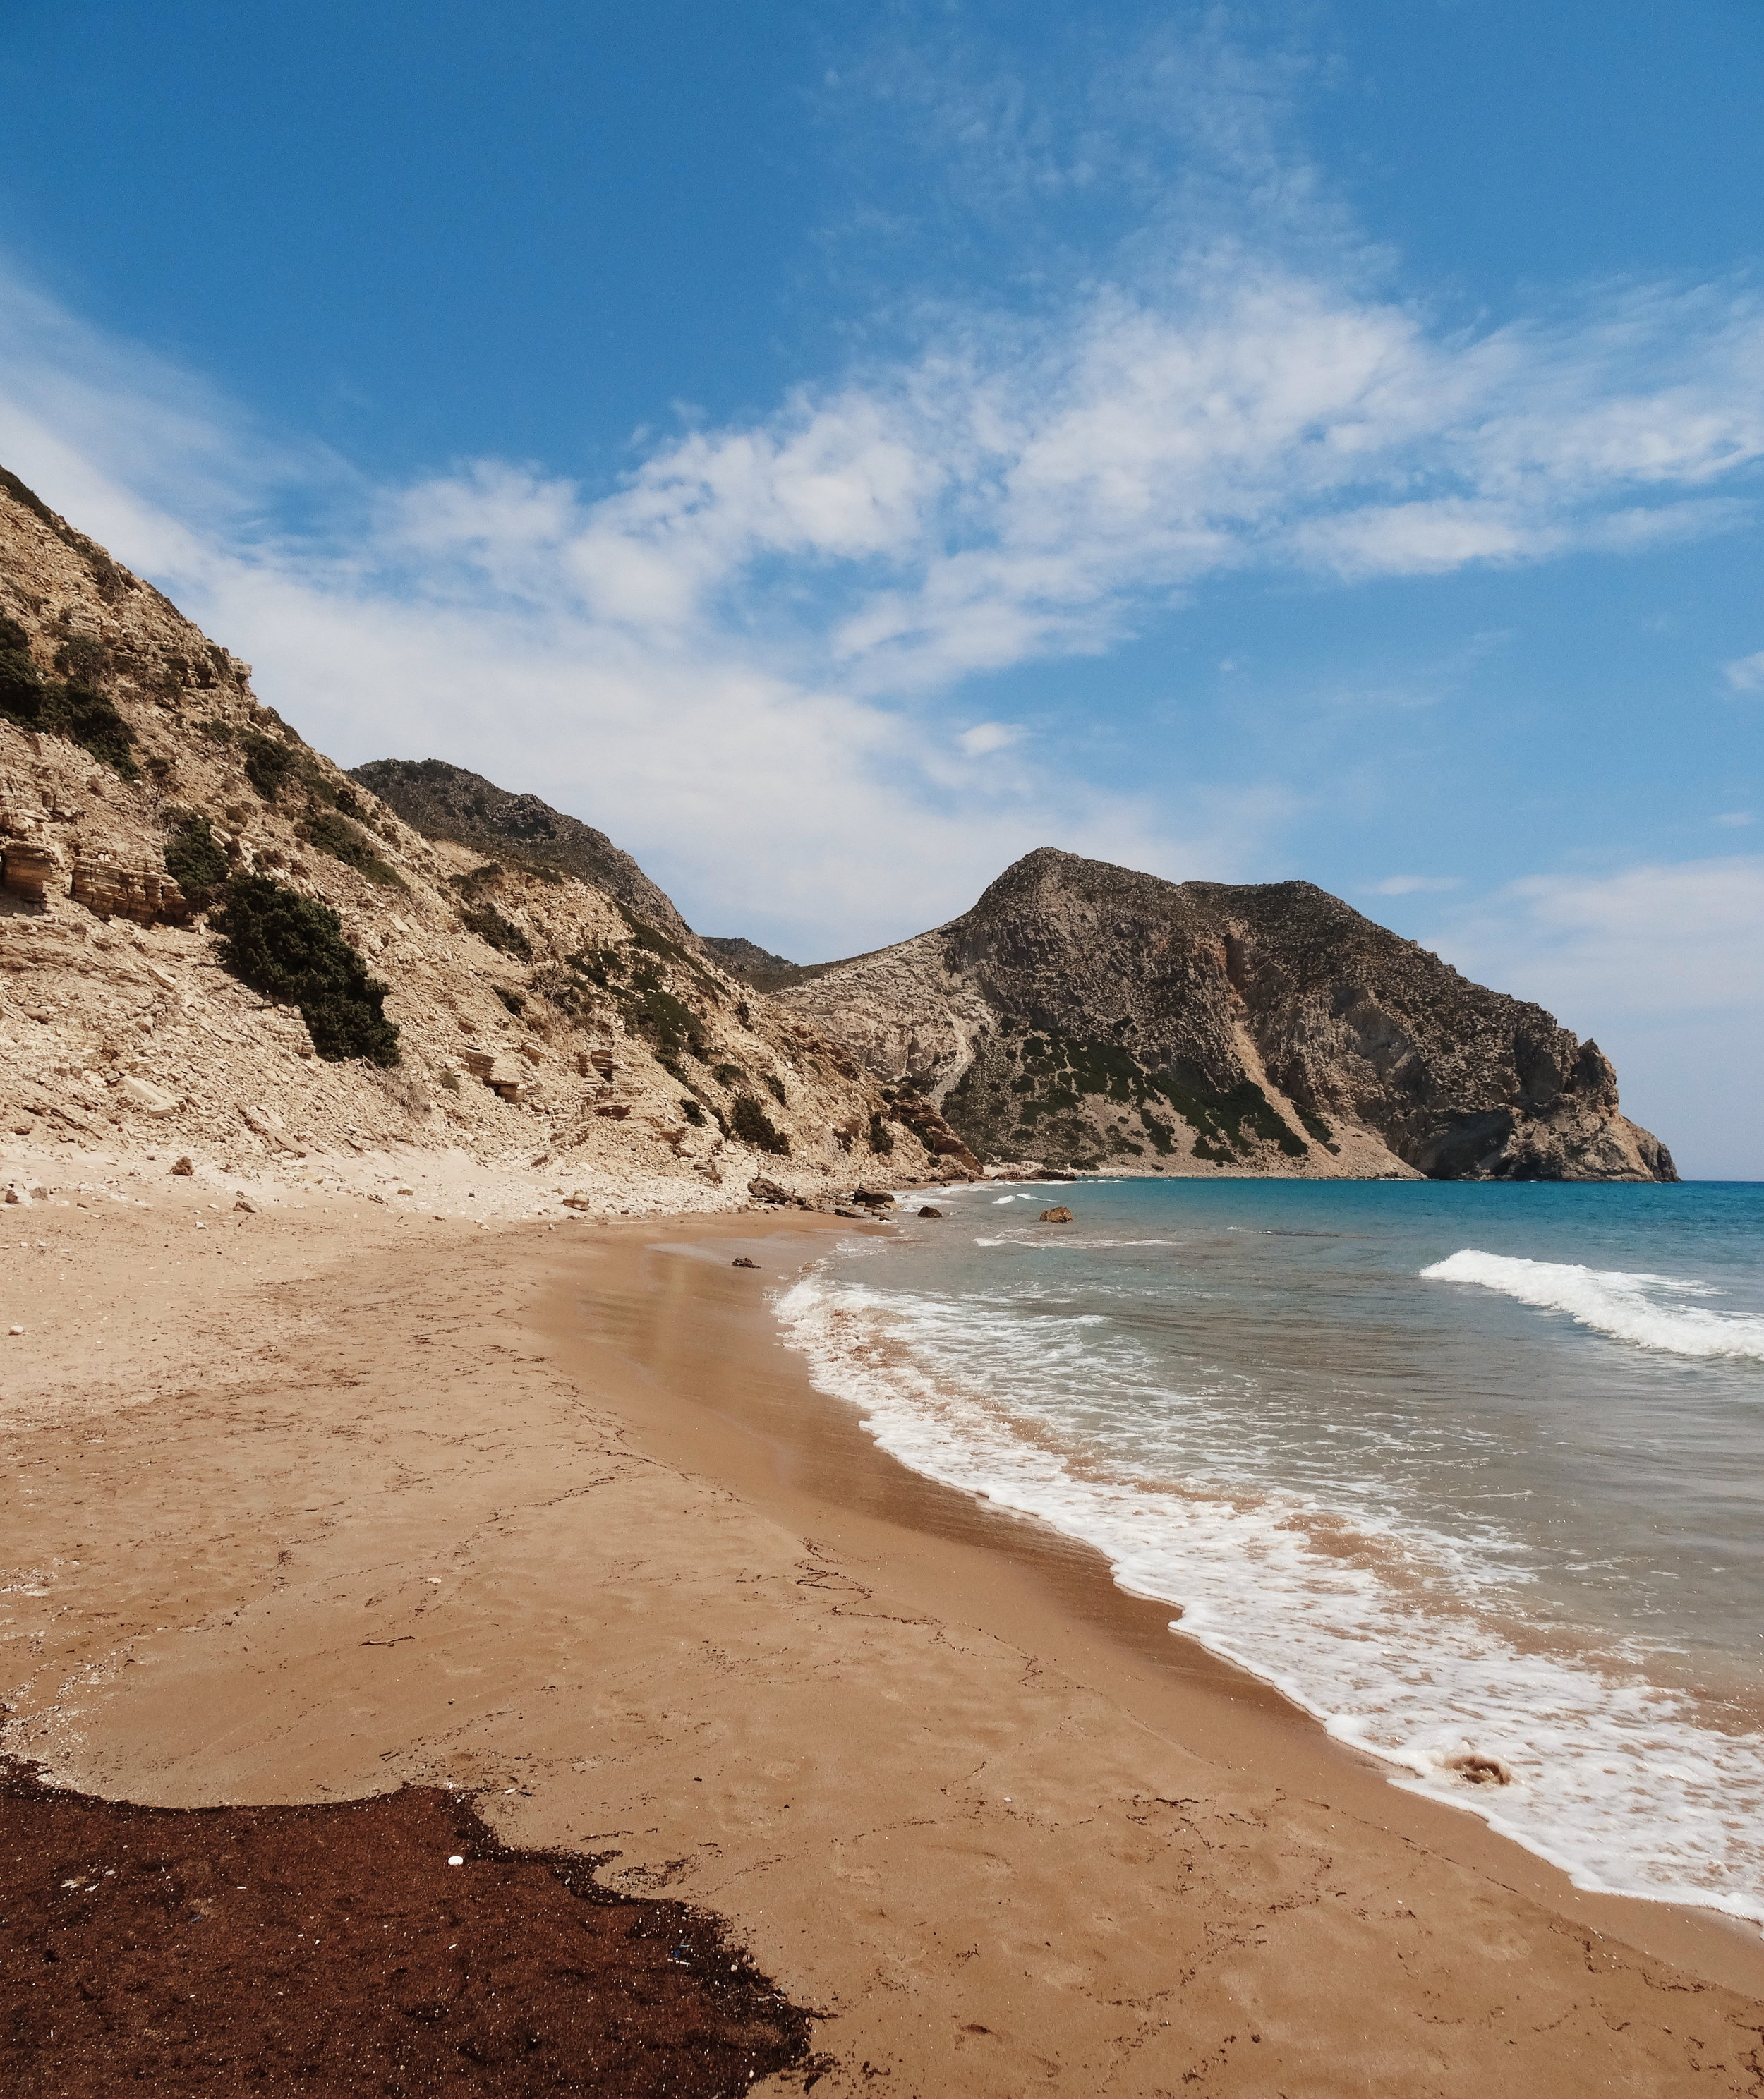 kos-kreikka-kokemuksia-kavo-paradiso-mona-kajander-matkablogi